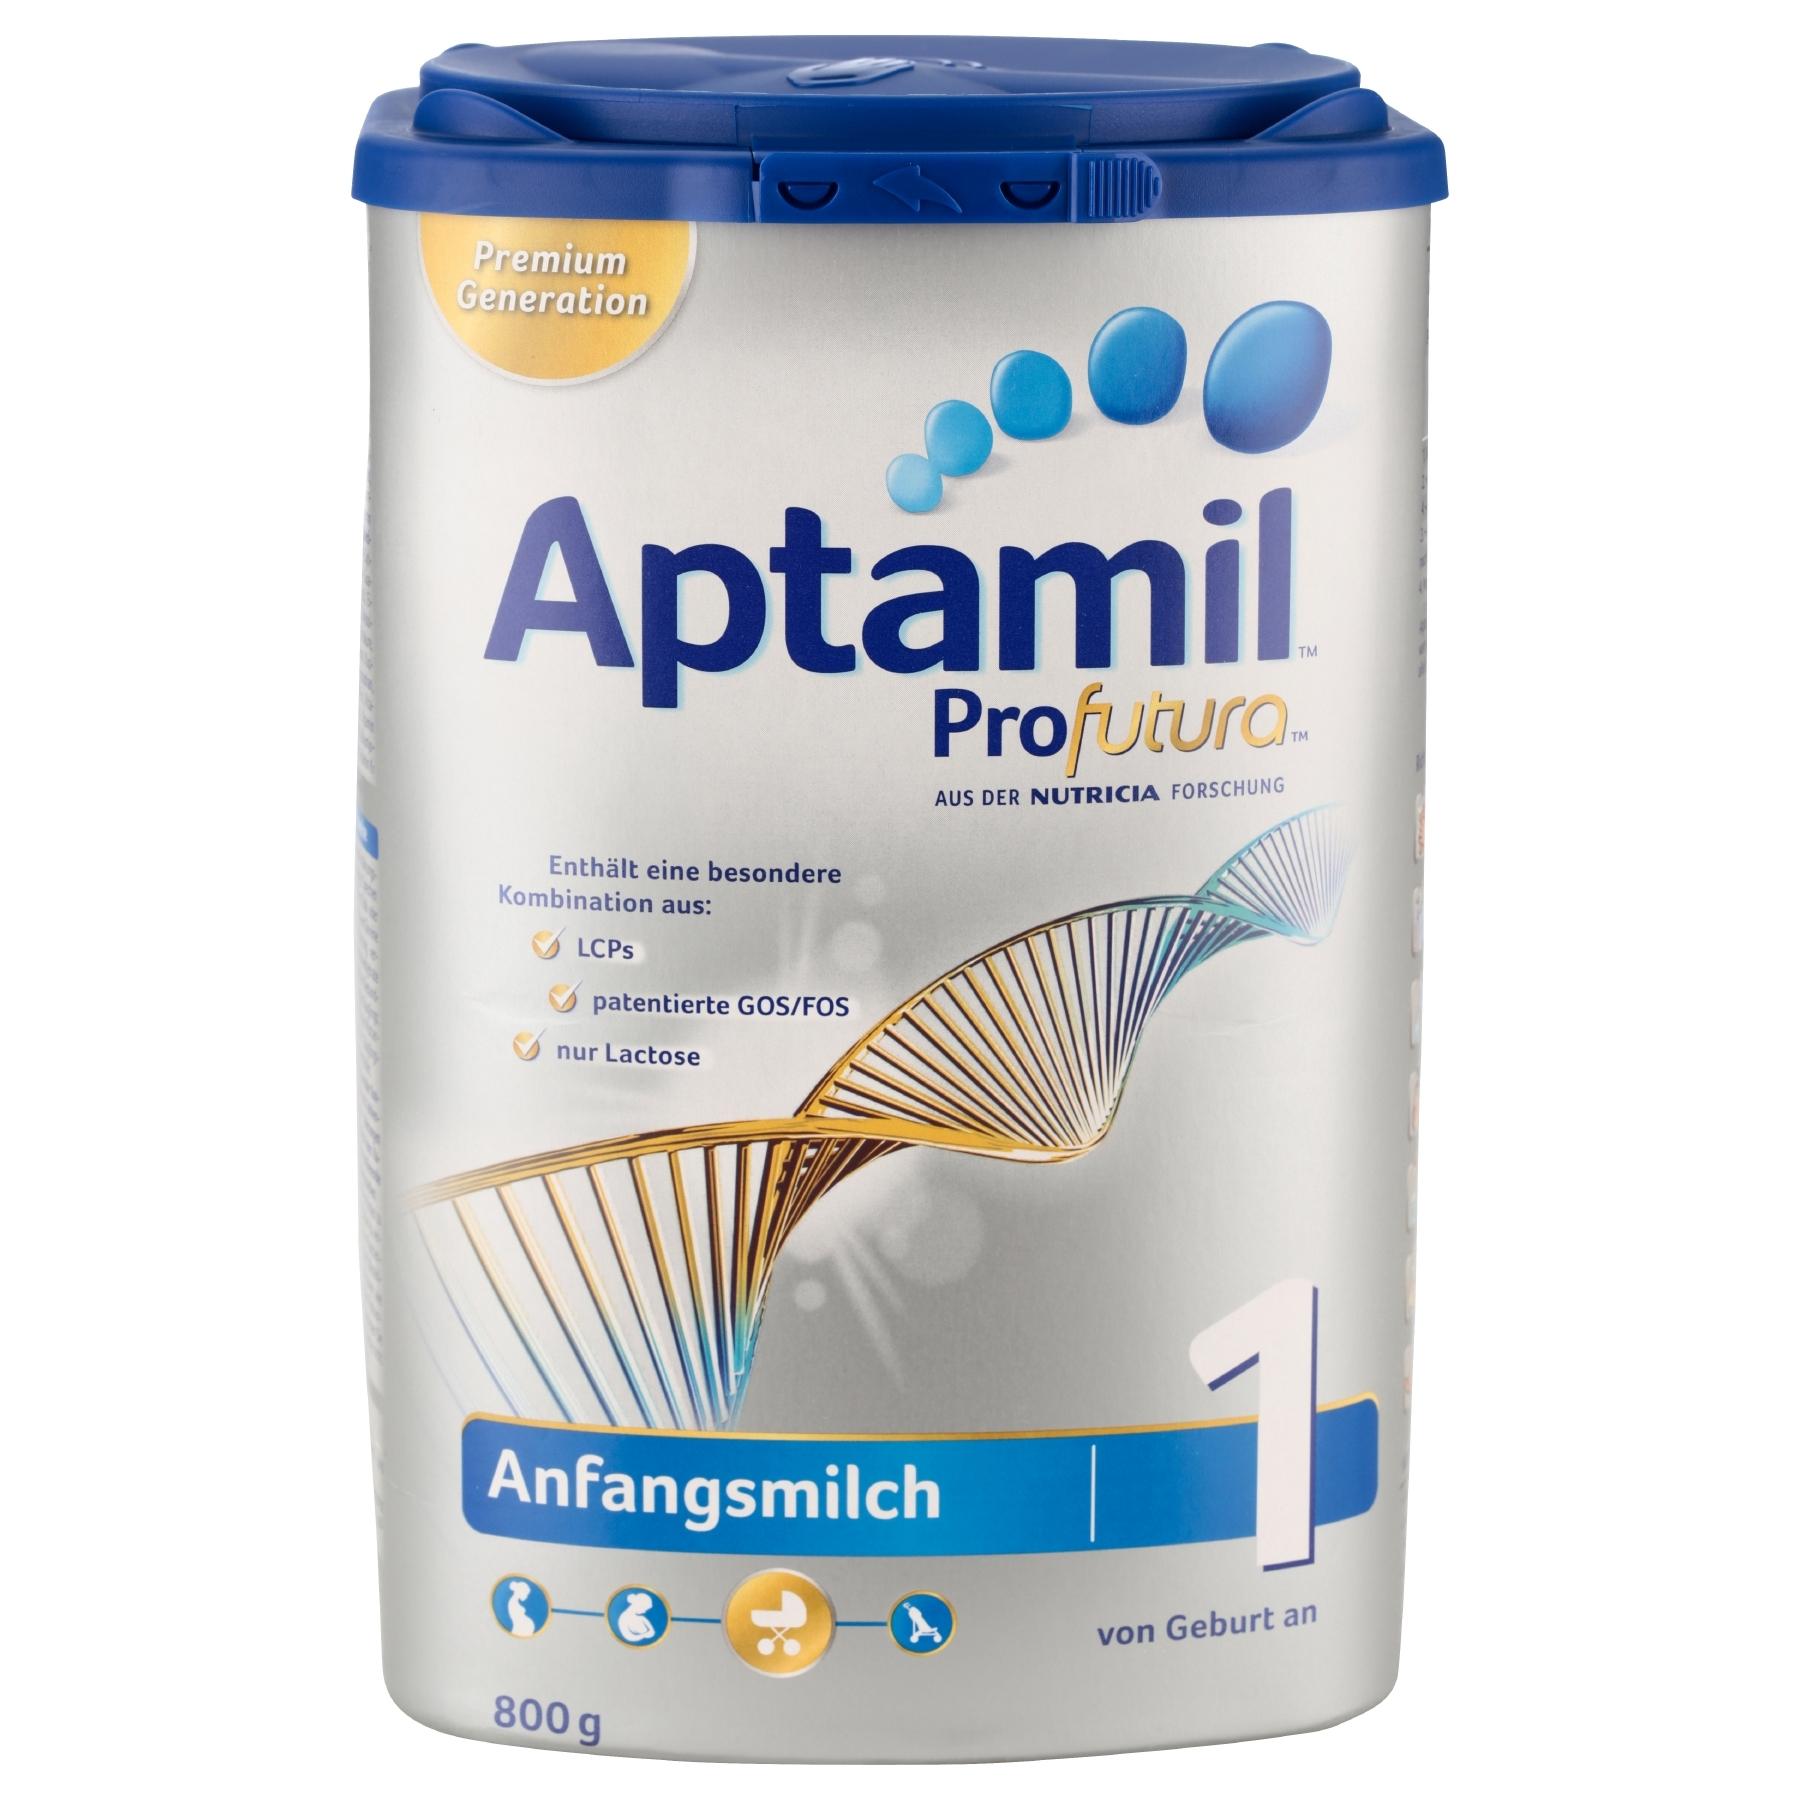 Aptamil Profutura 1 Anfangsmilch